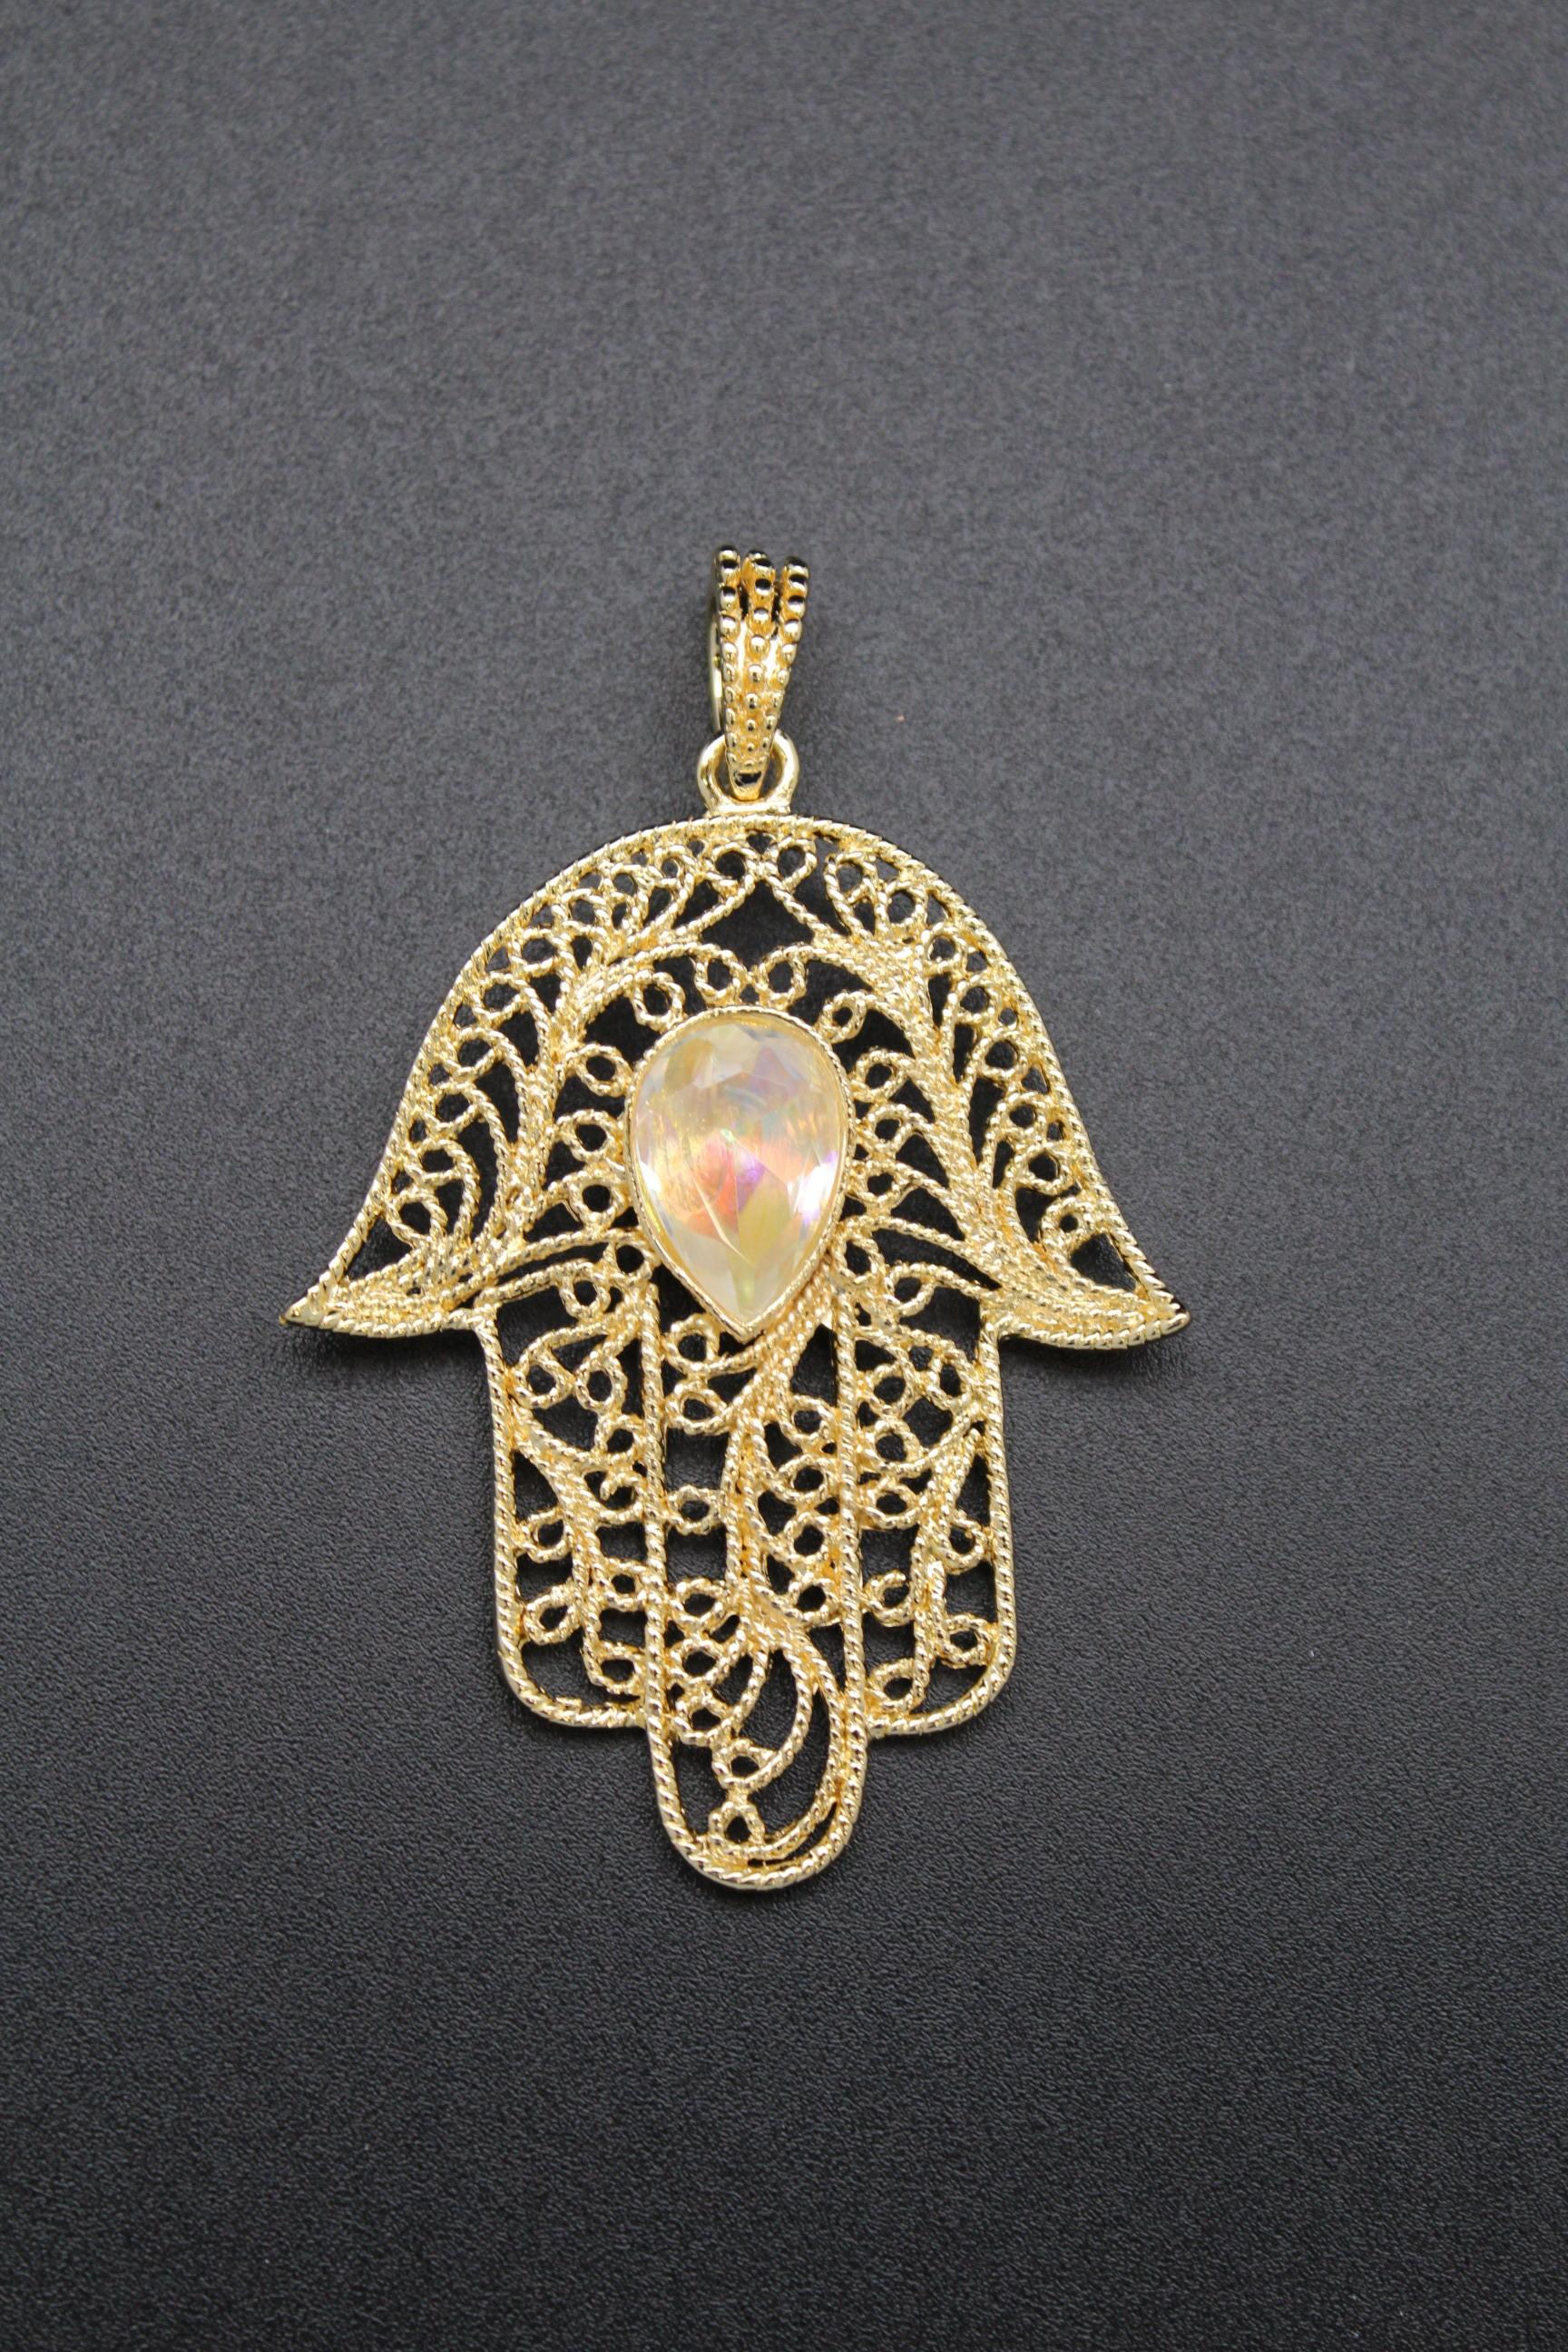 Pendentif main de fatma plaque or bijoux la mode - Bougie main de fatma ...